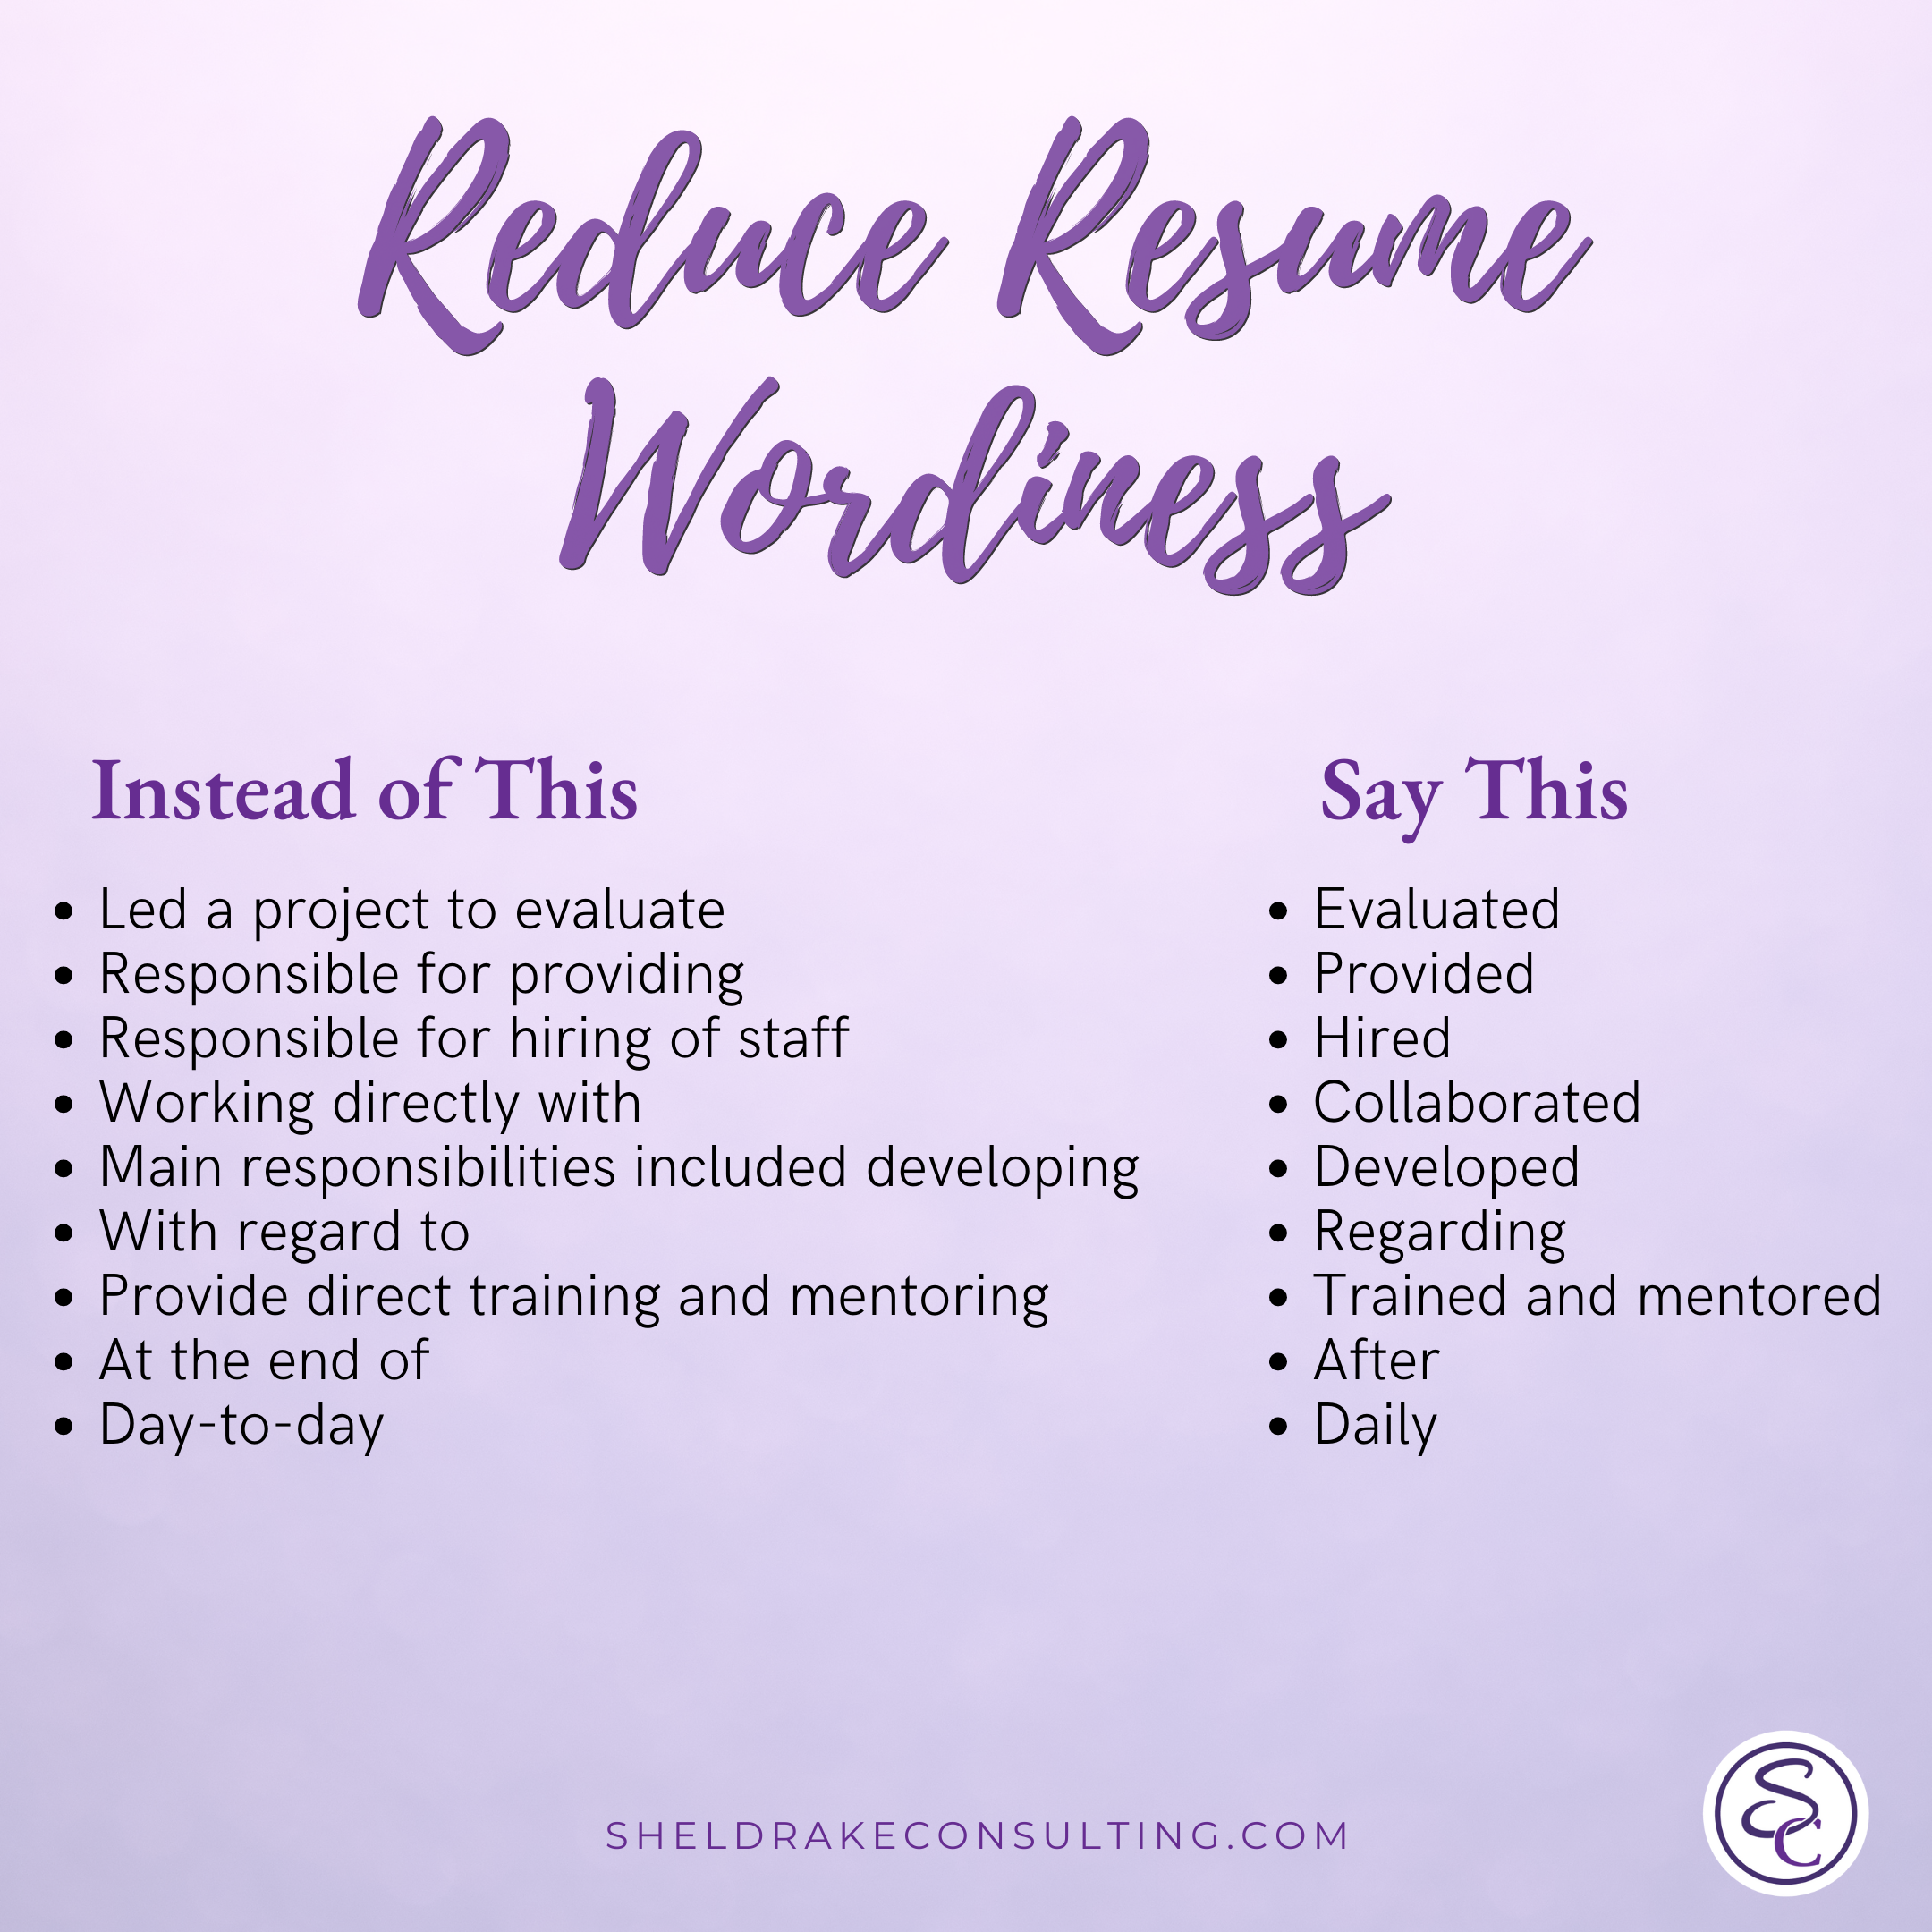 Reduce Resume Wordiness